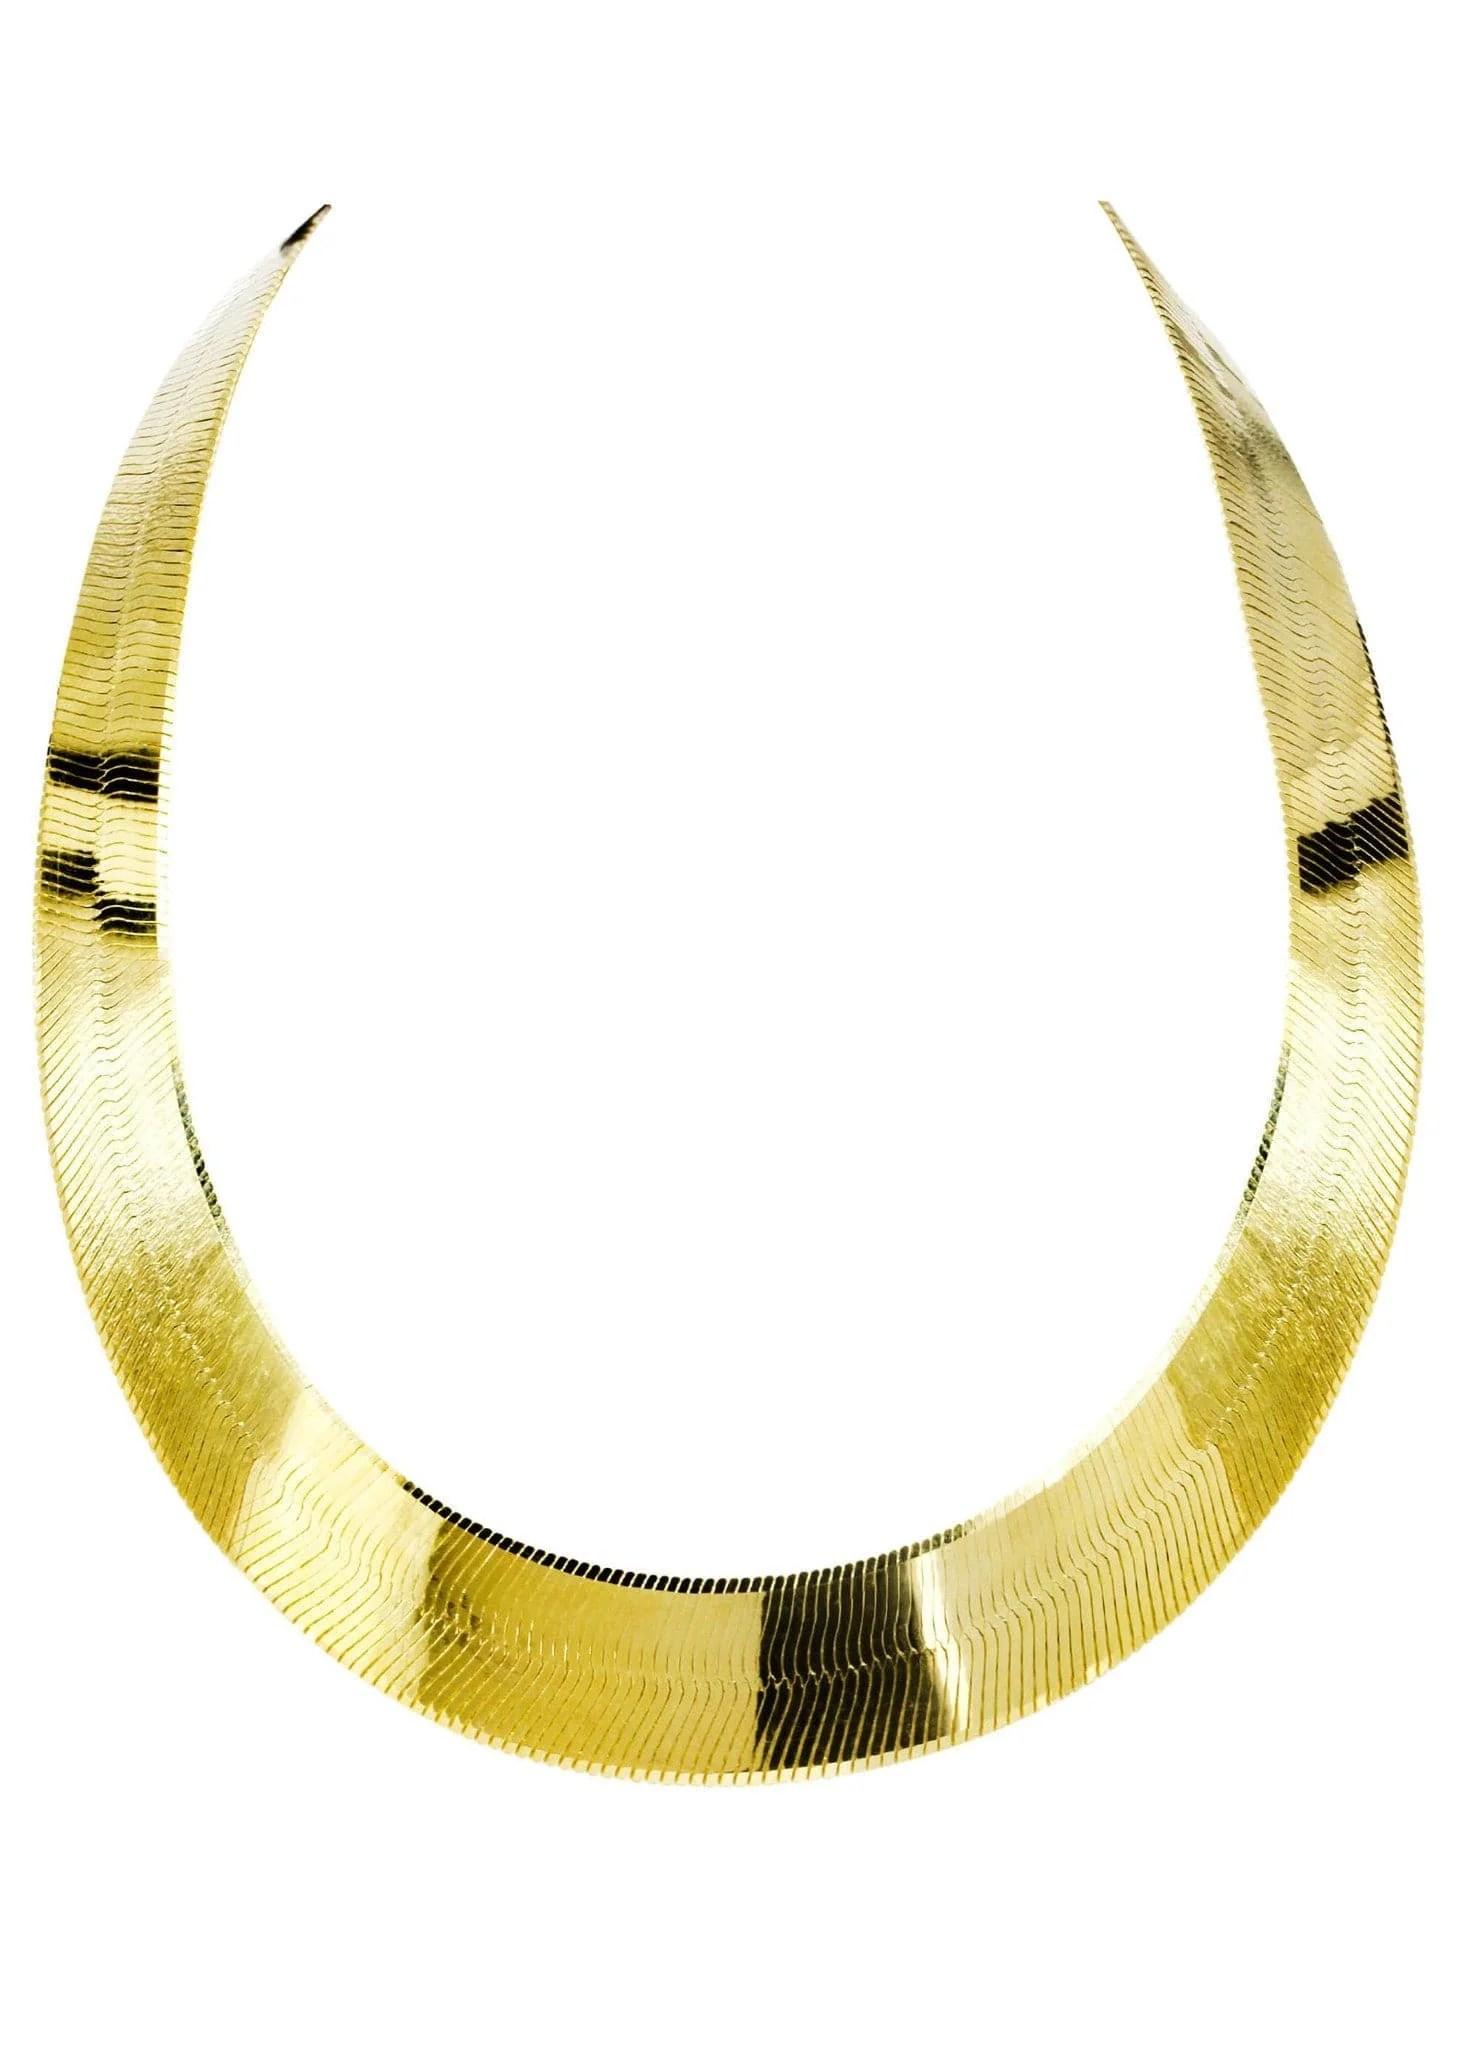 Gold Chain - Mens Herringbone 10k Frostnyc